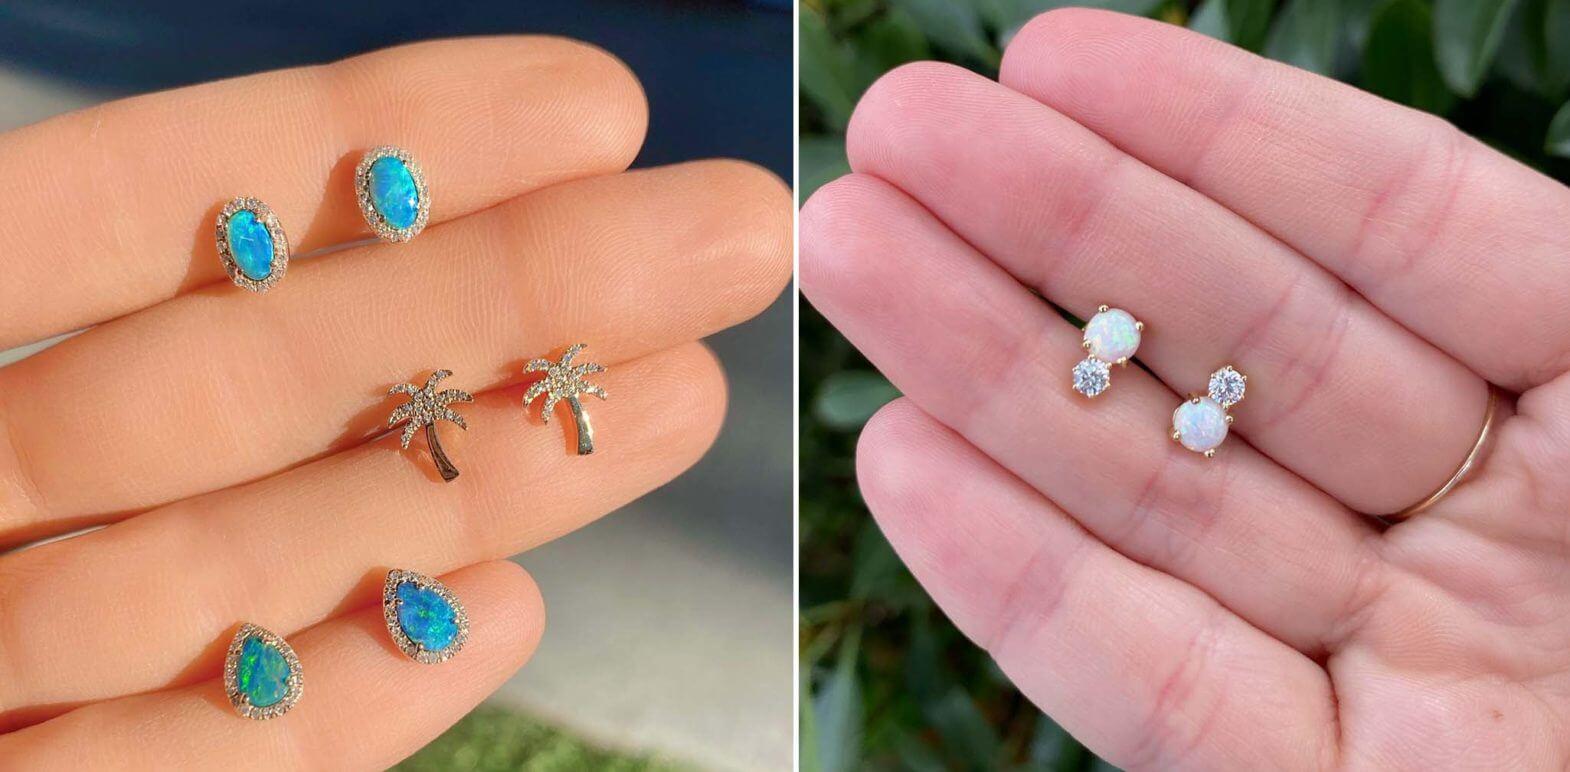 October's Birthstone Opal